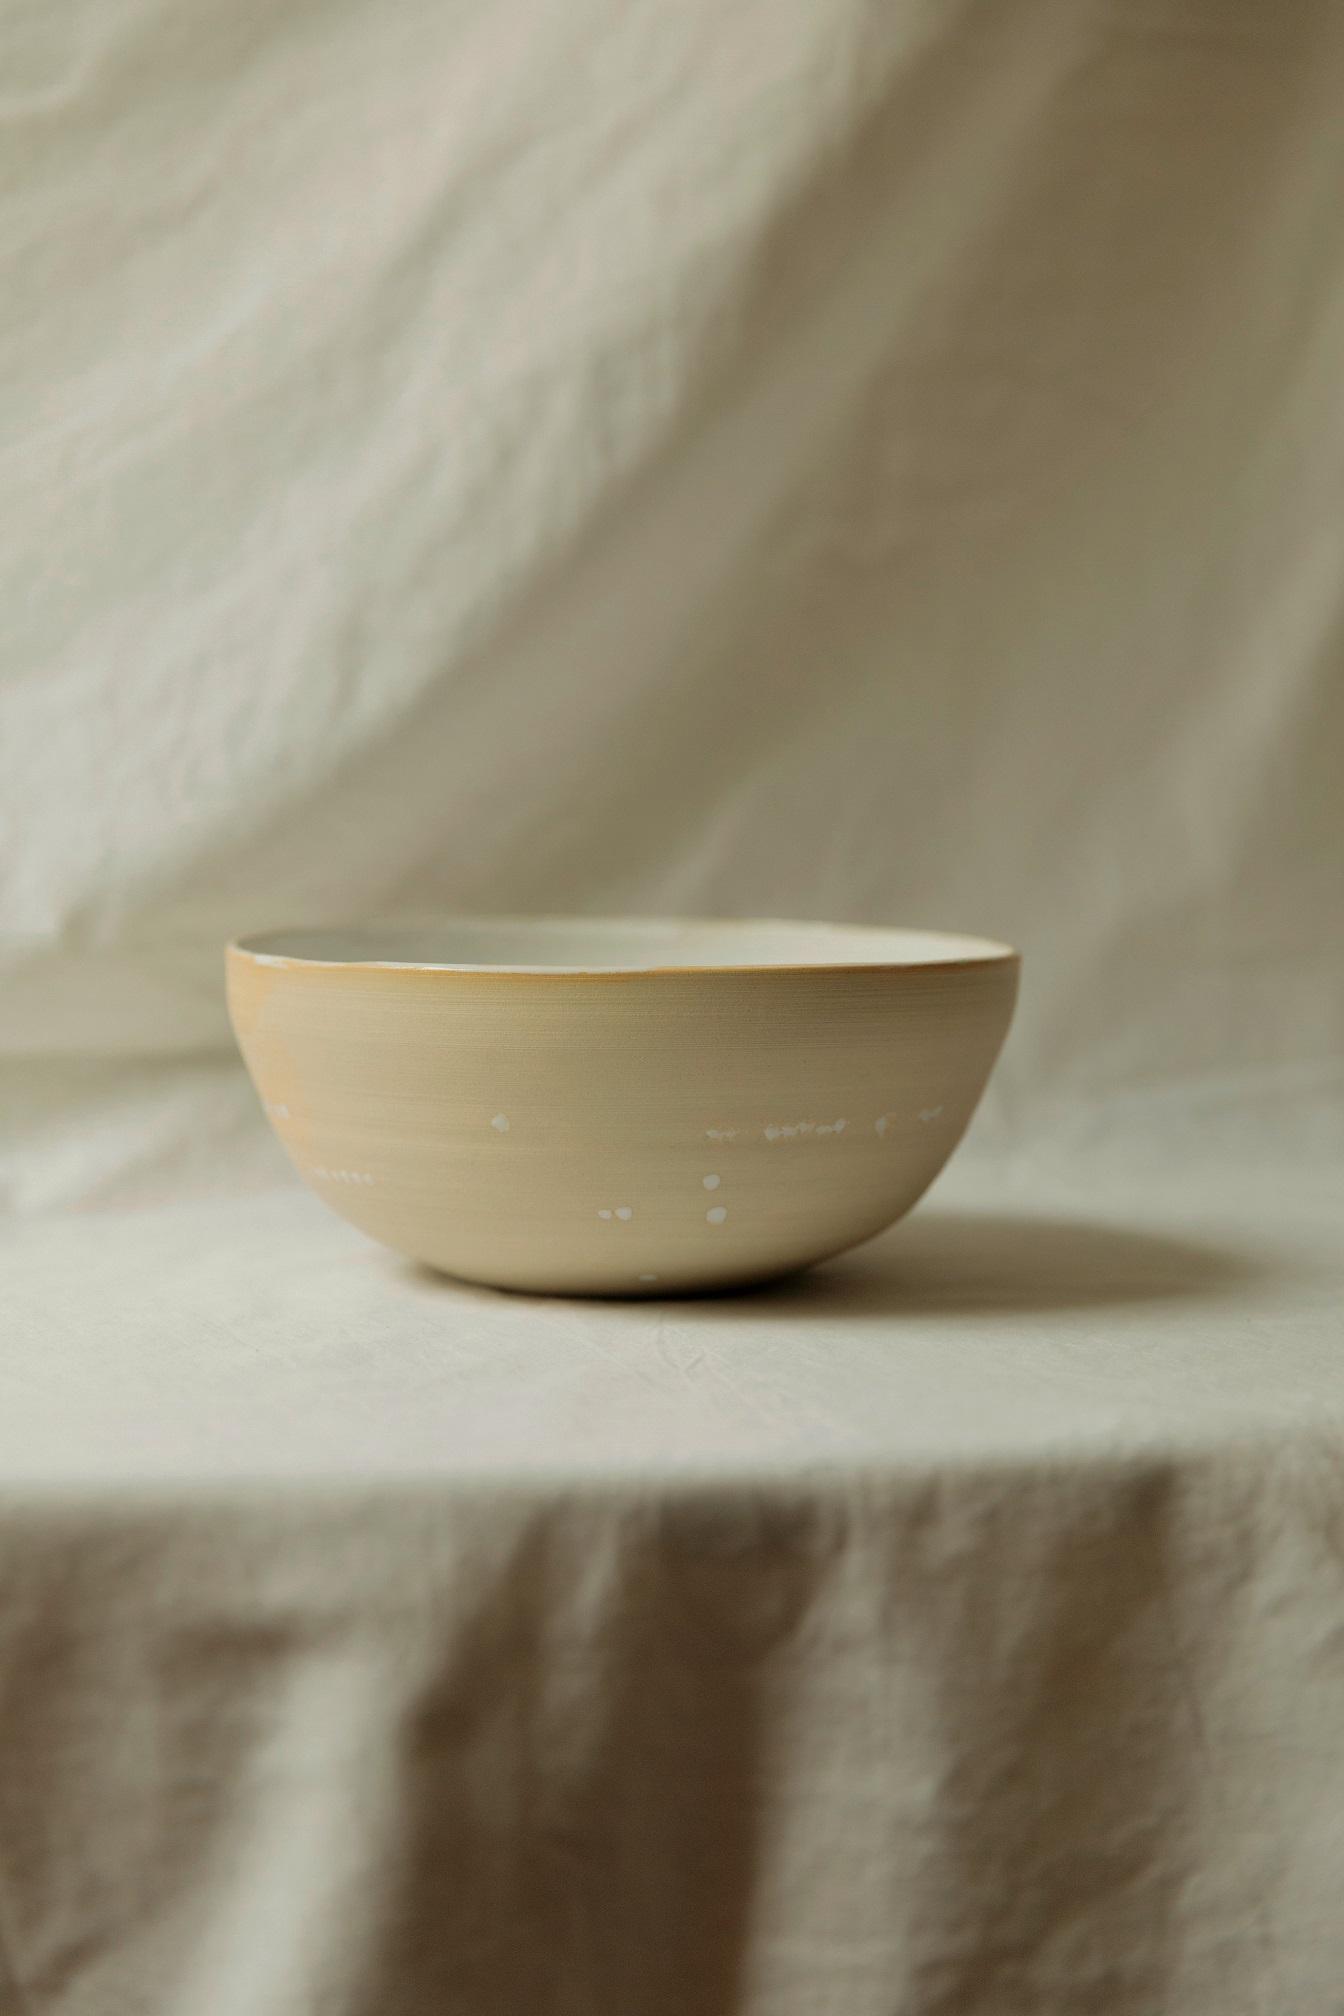 Keramik_Highres_O2A3802